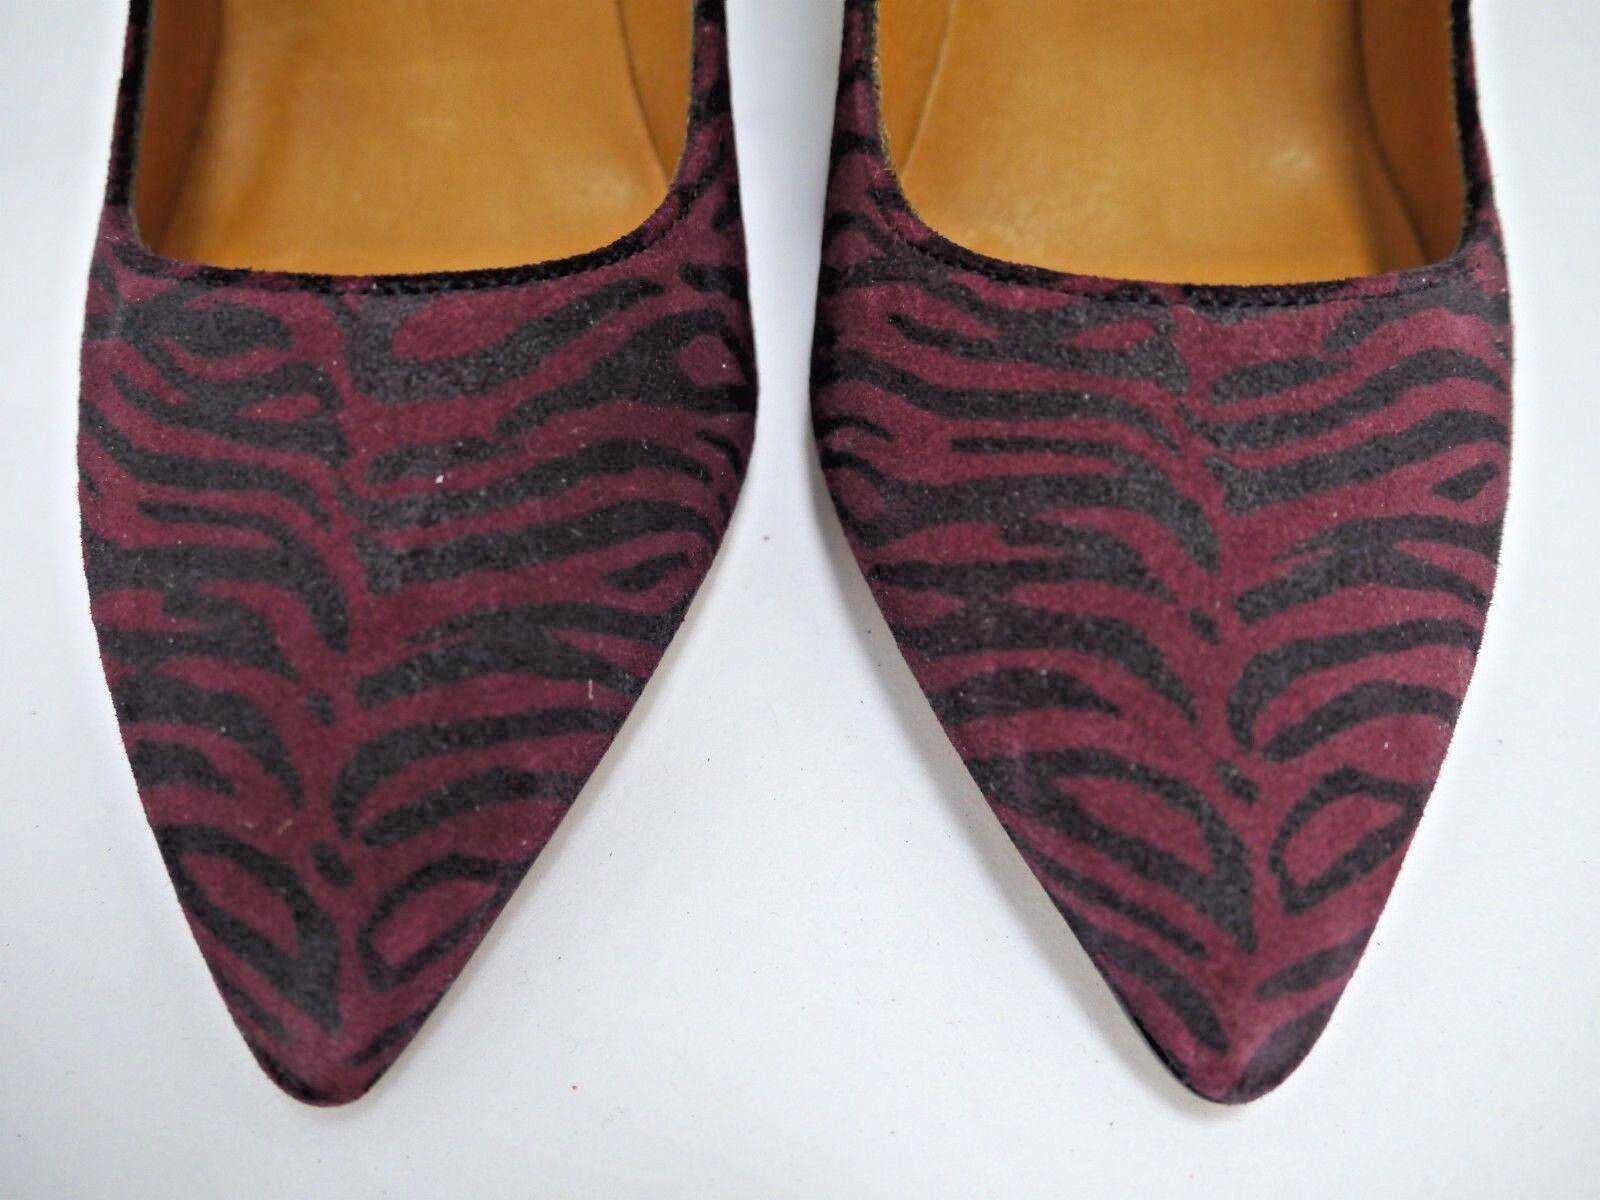 NEW ISABEL MARANT MARANT MARANT GATSY zebra suede heels shoes size 40 dd8ea6